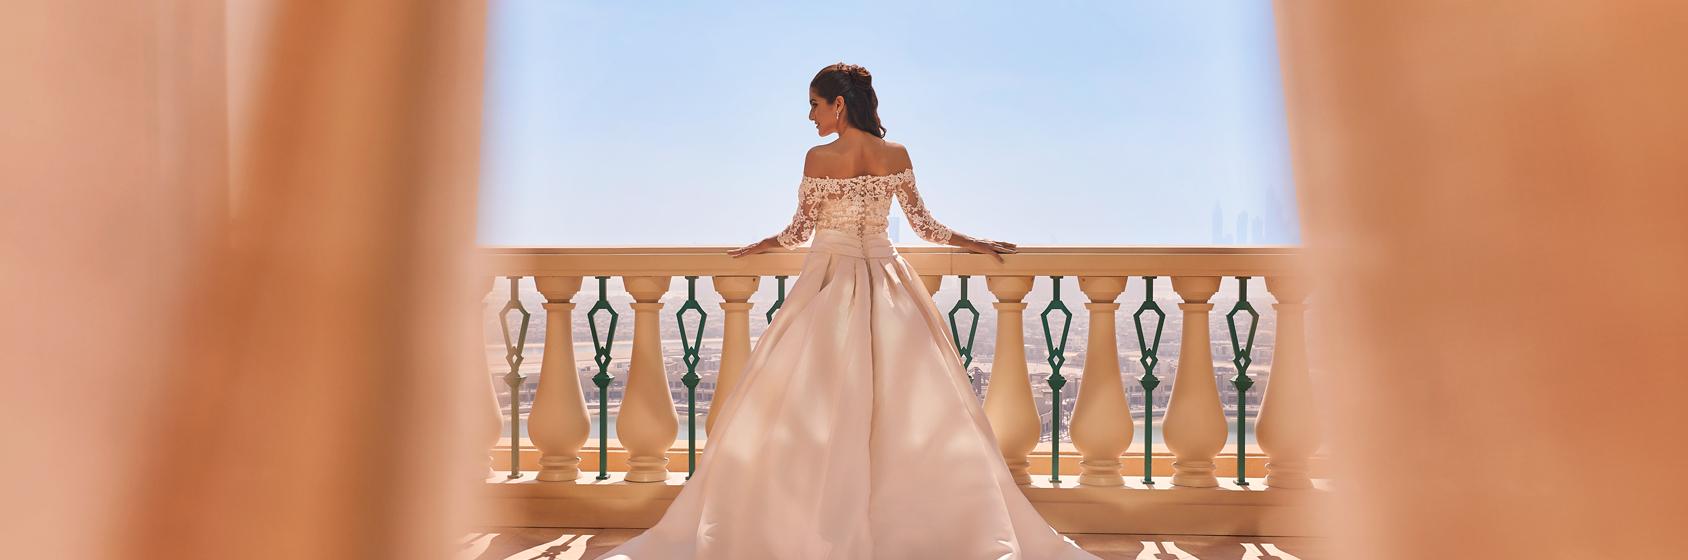 Celebrate Your Wedding at Atlantis, The Palm